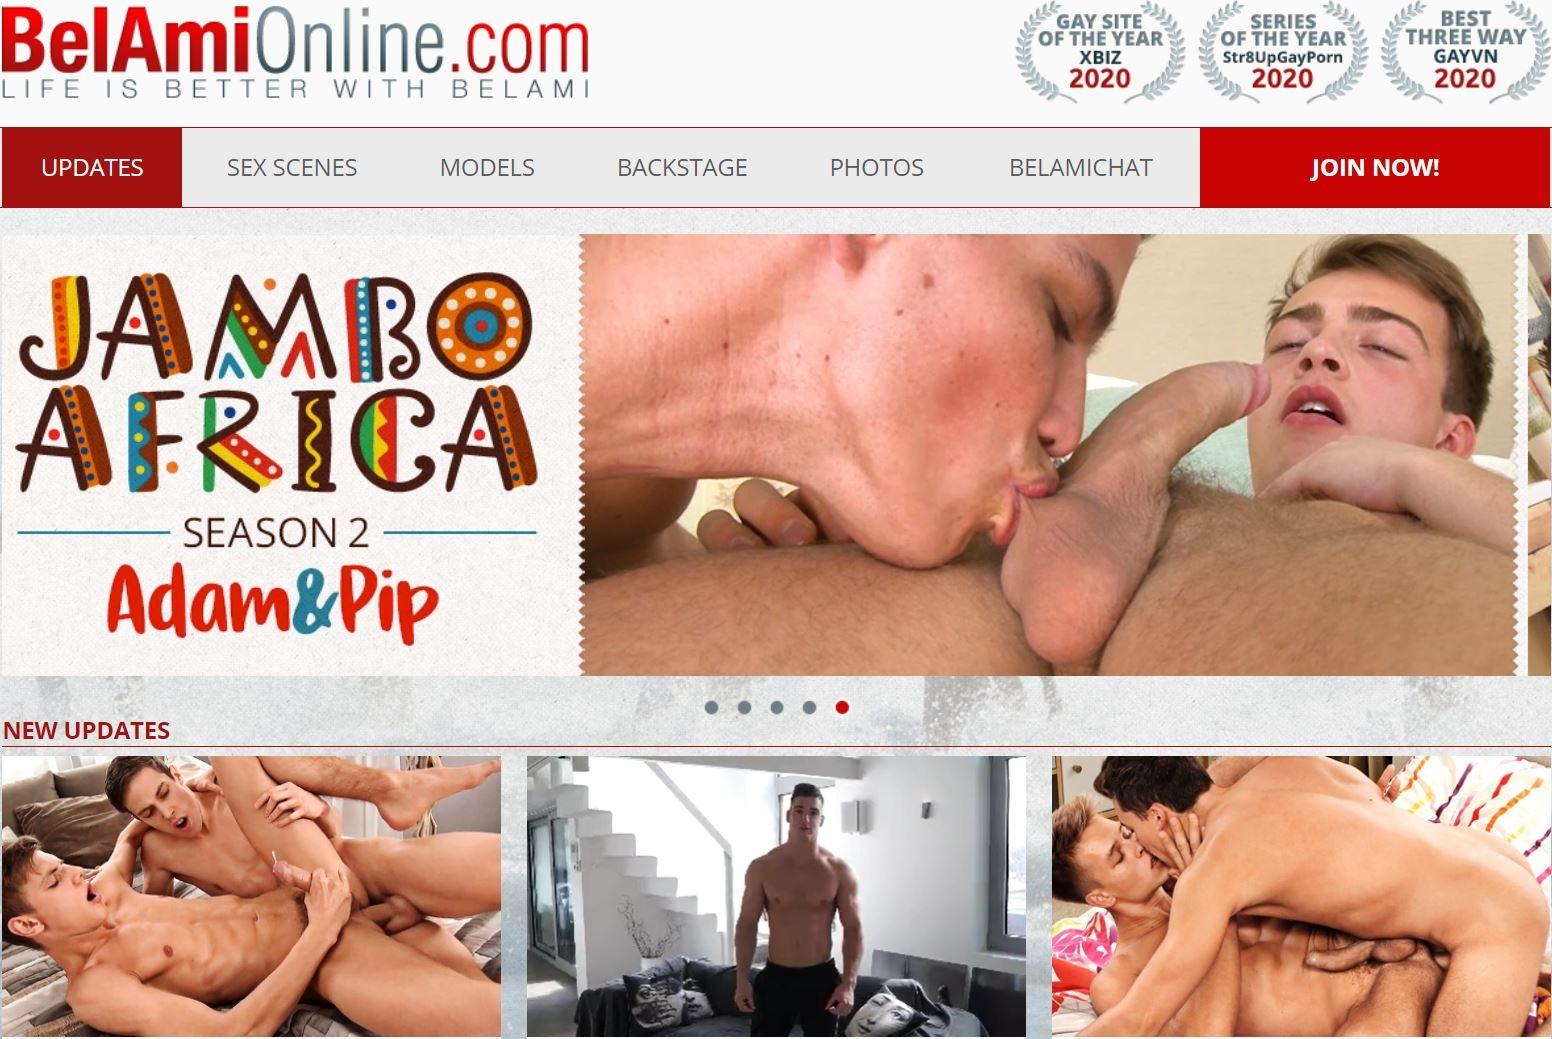 Belami Online Site Review My Gay Porn List - Belami Online